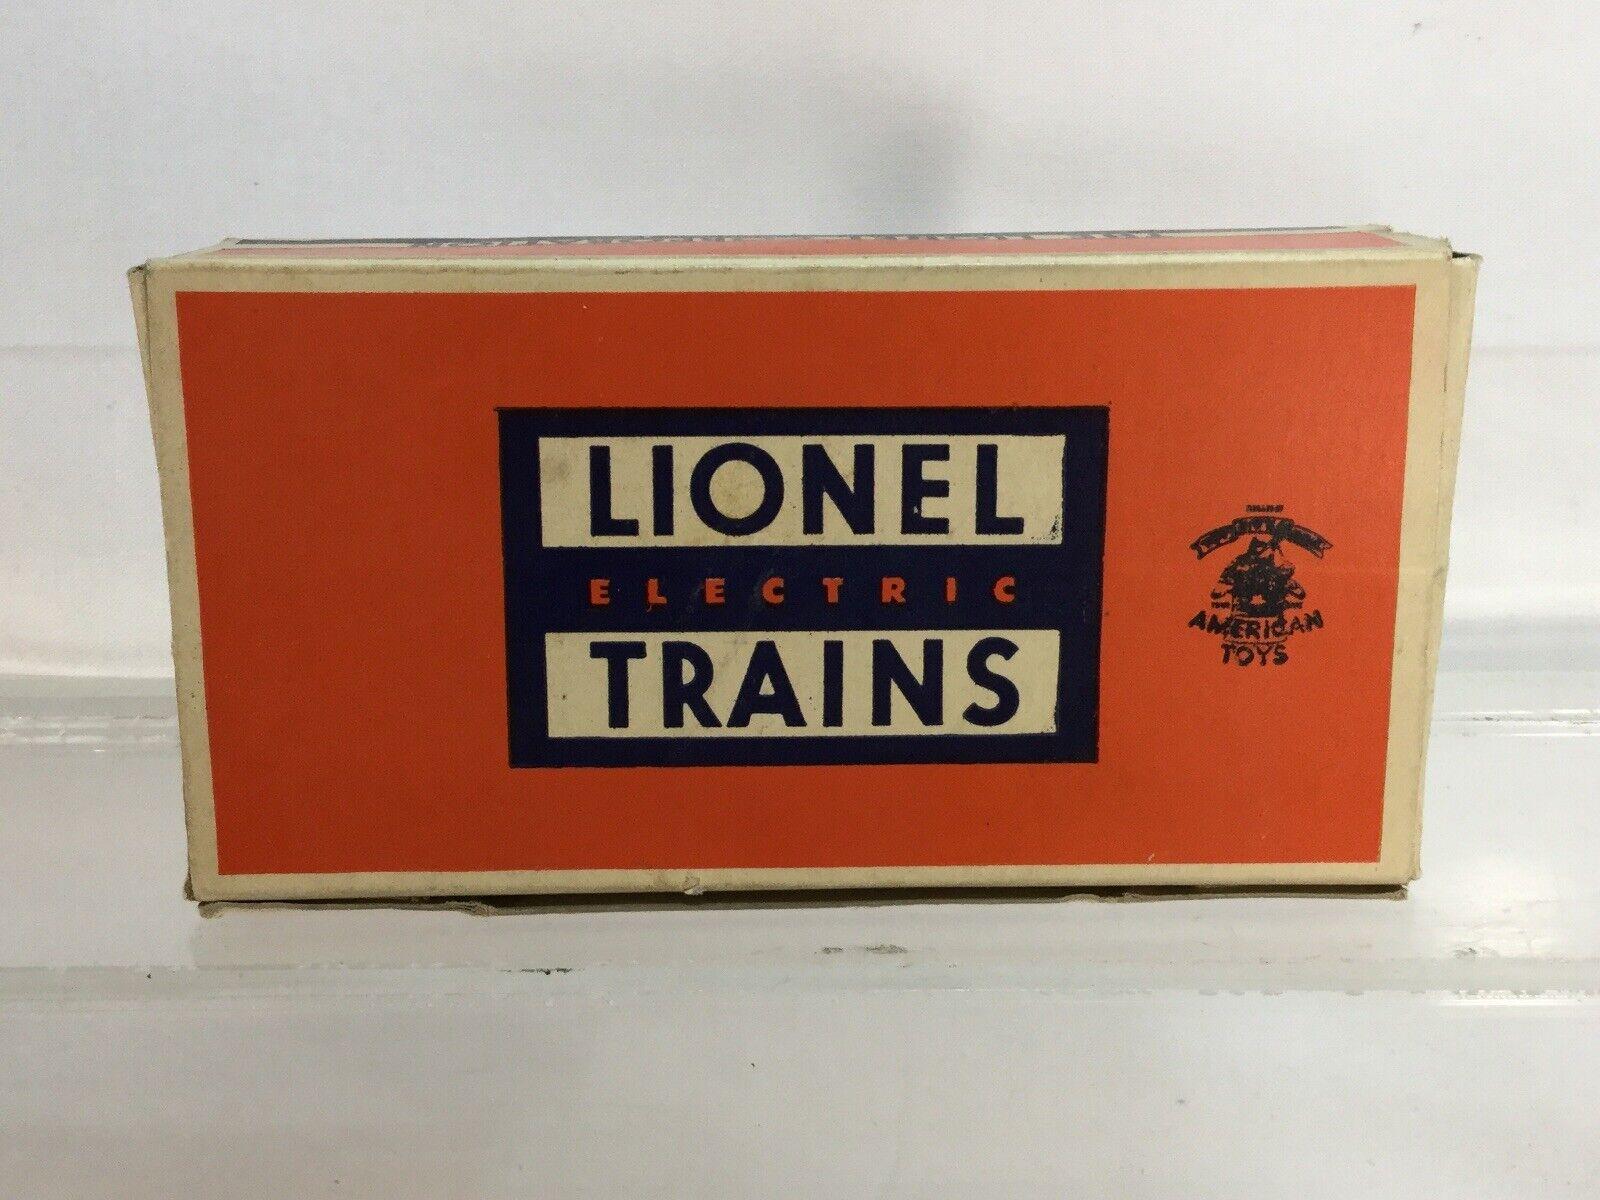 Ultra Raro Trenes Lionel figura conjunto de la posguerra Caja Original Excelente